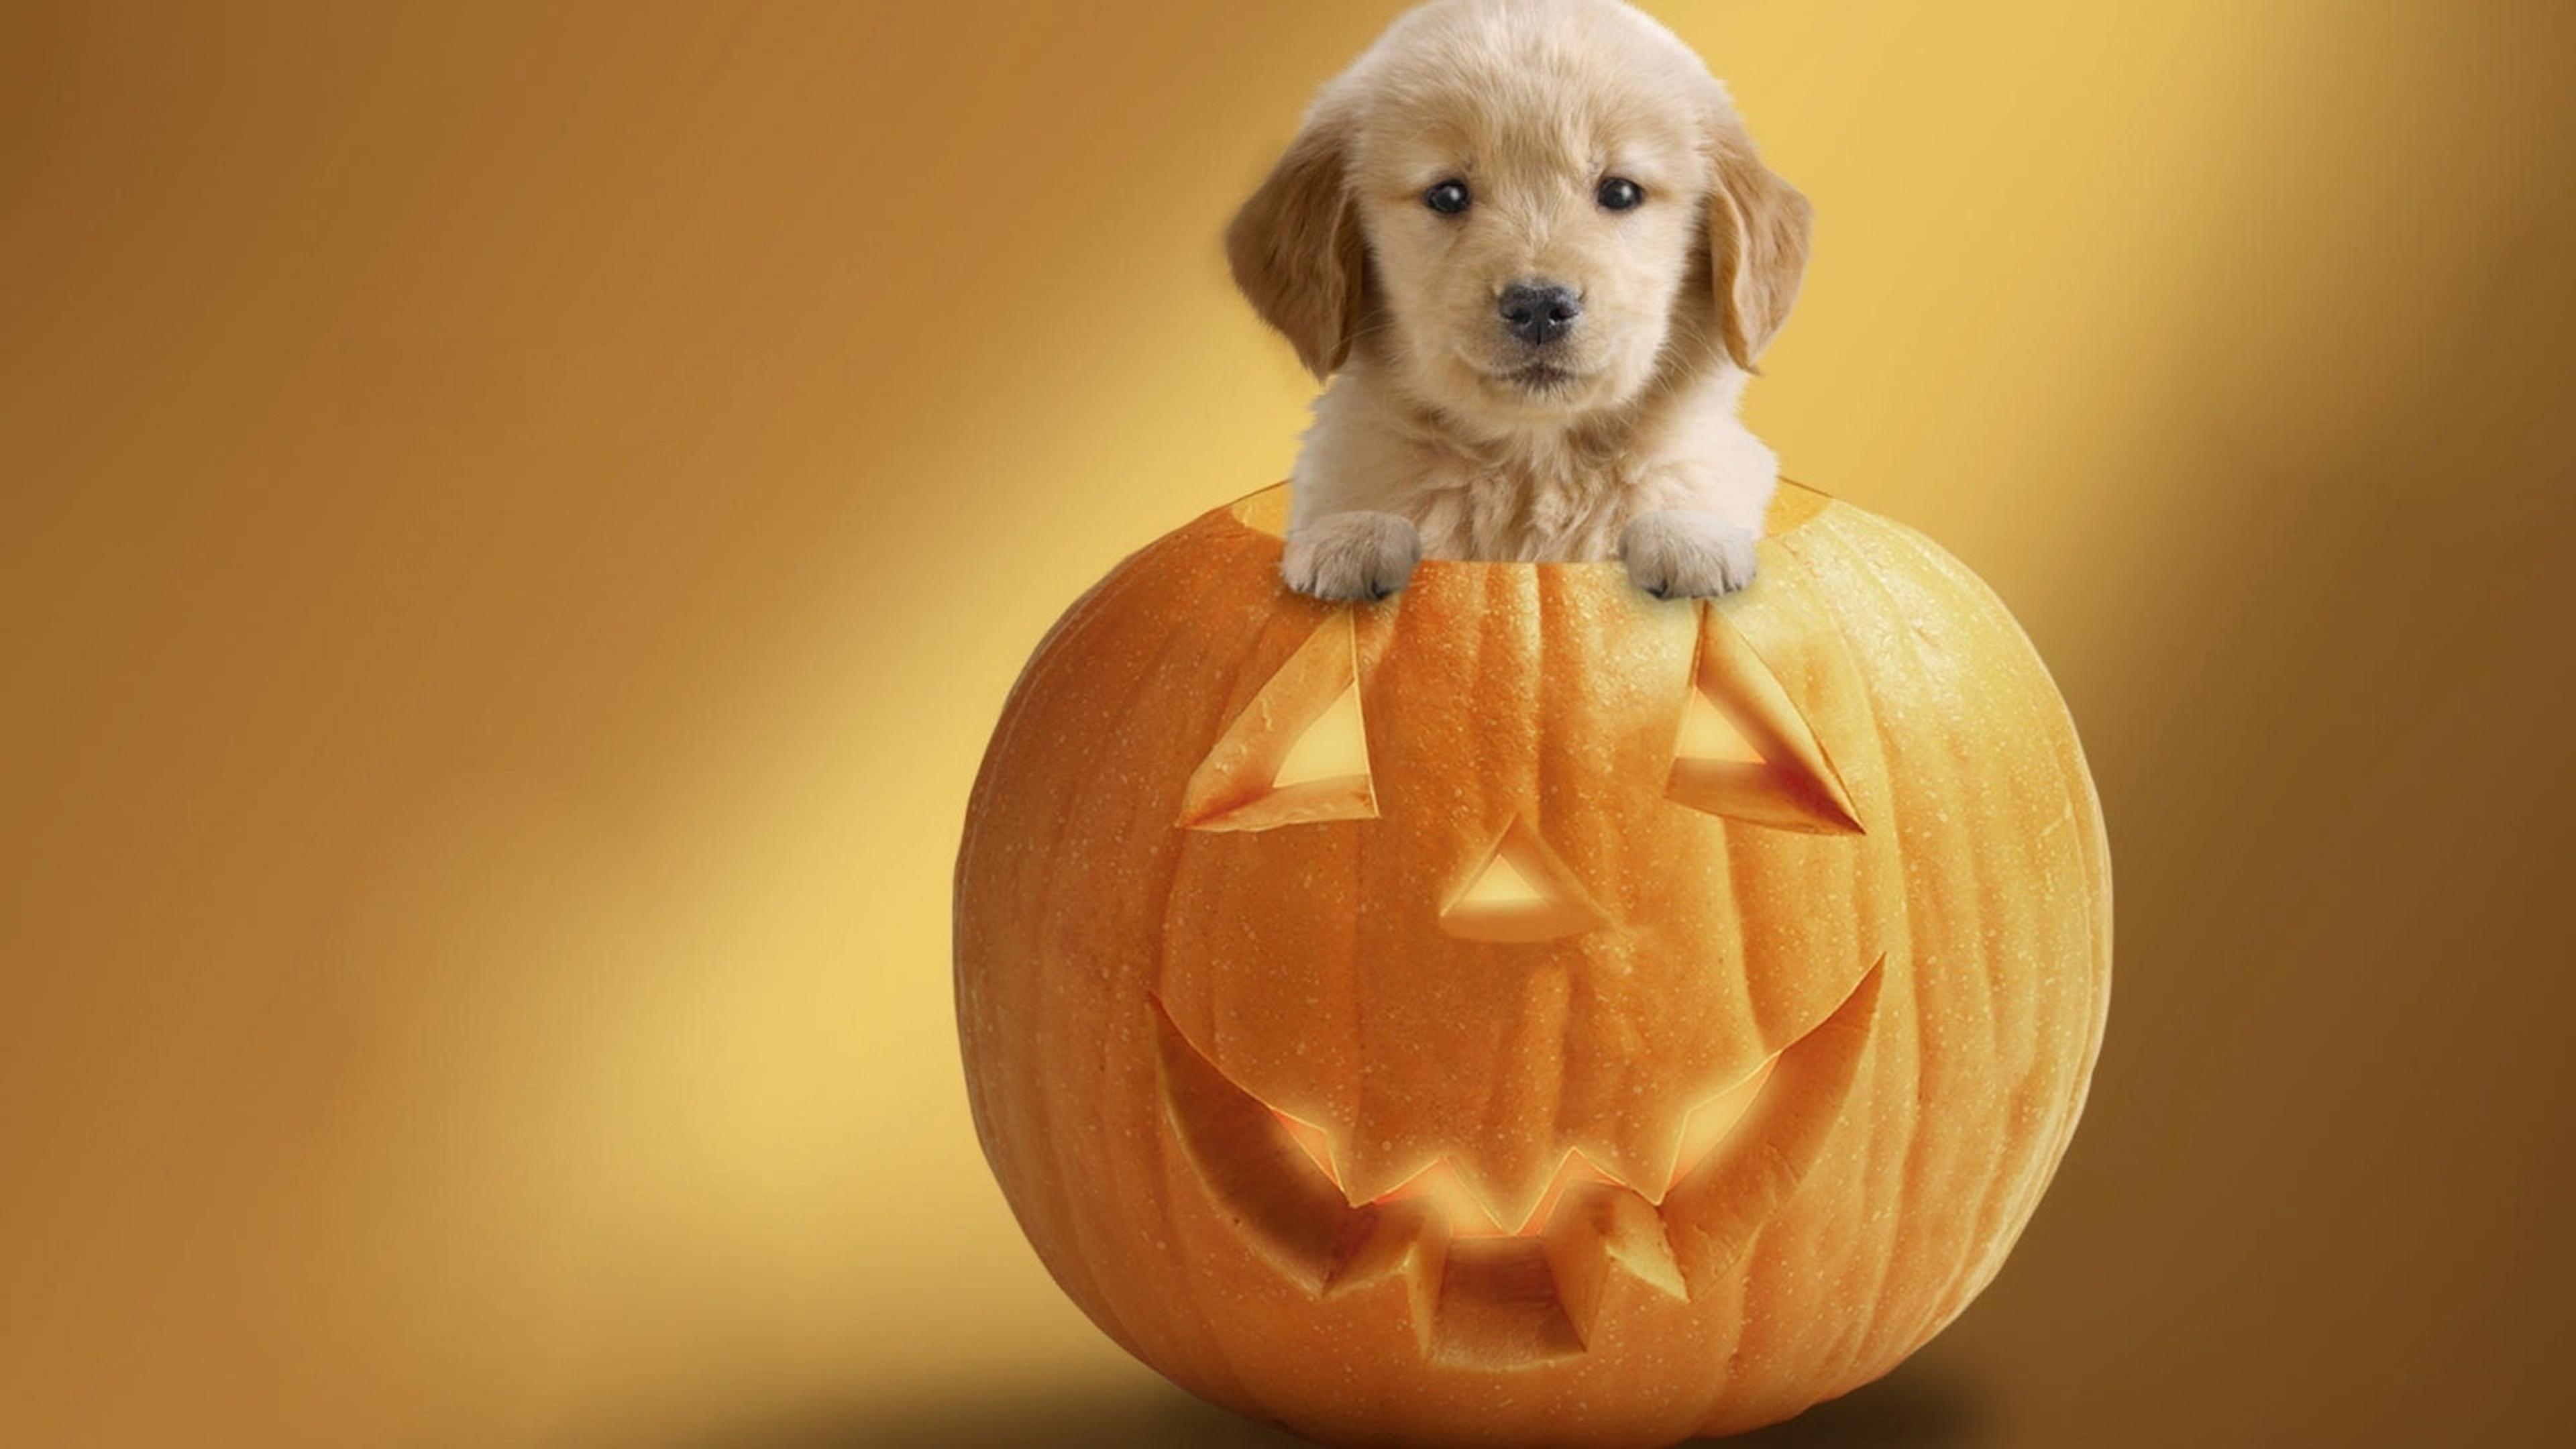 Download Wallpaper Halloween Puppy - cute-puppy-in-a-pumpkin-halloween-time-3840x2160  Snapshot_217844.jpg